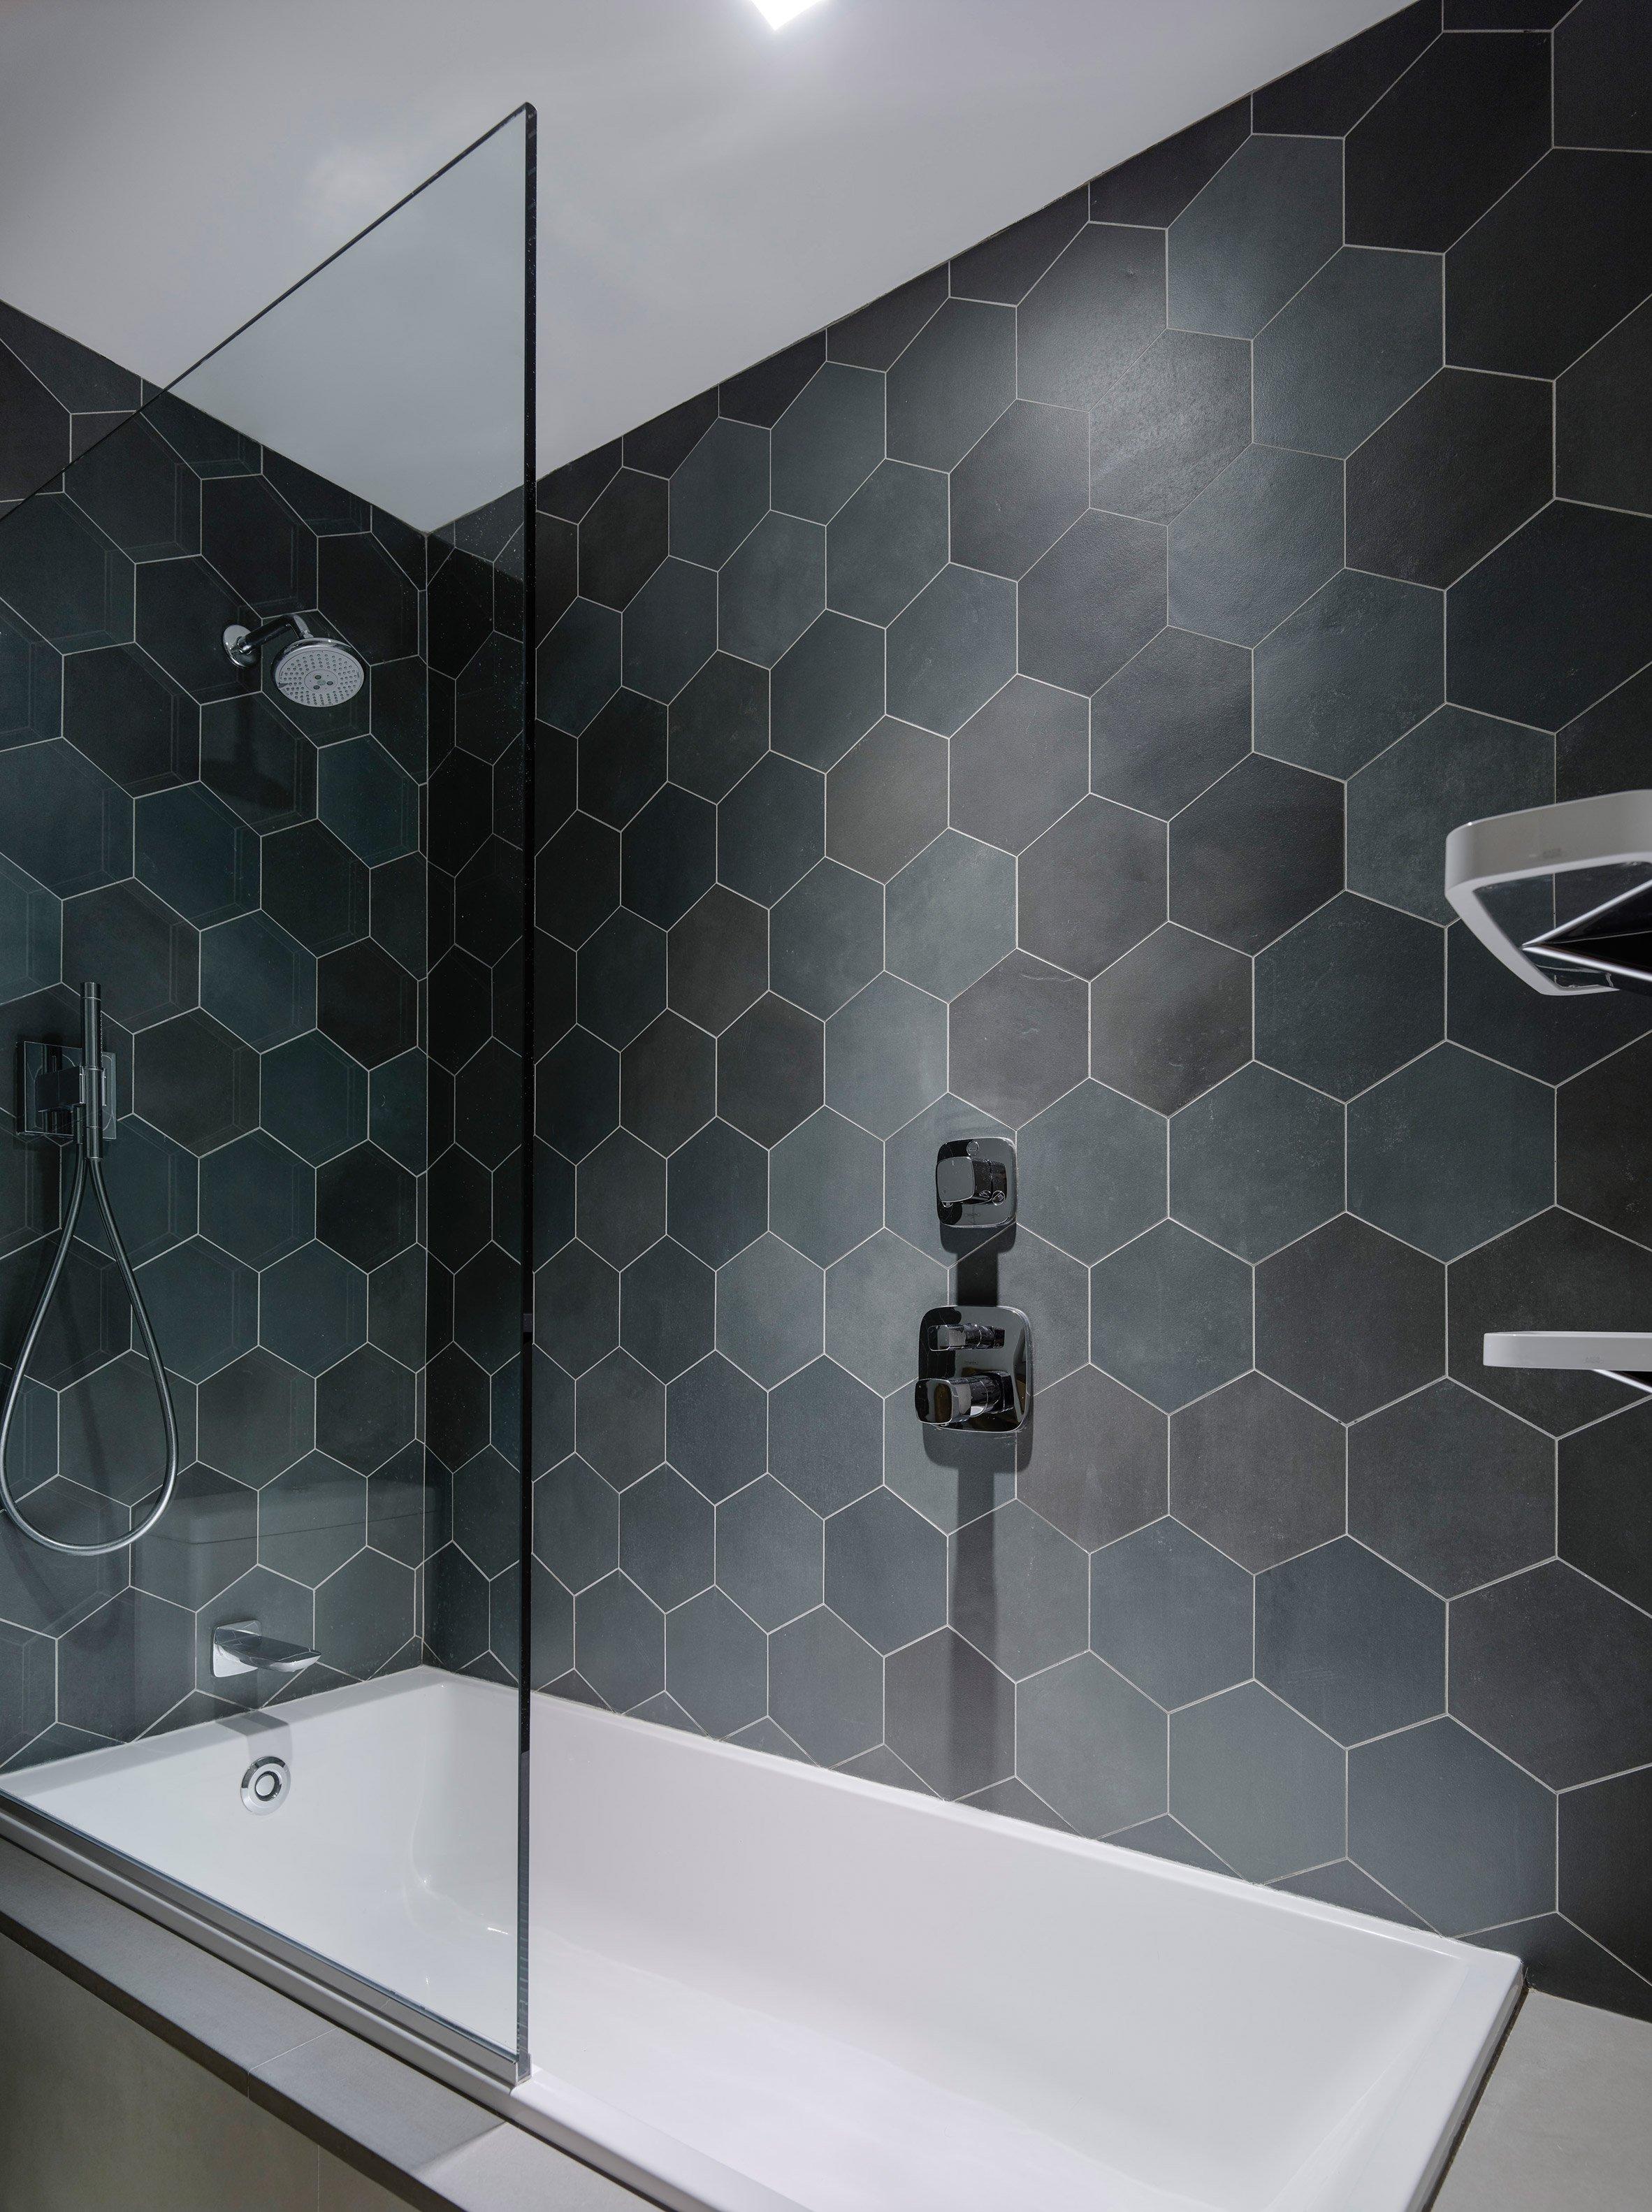 hexagon tiles on a bathroom's wall